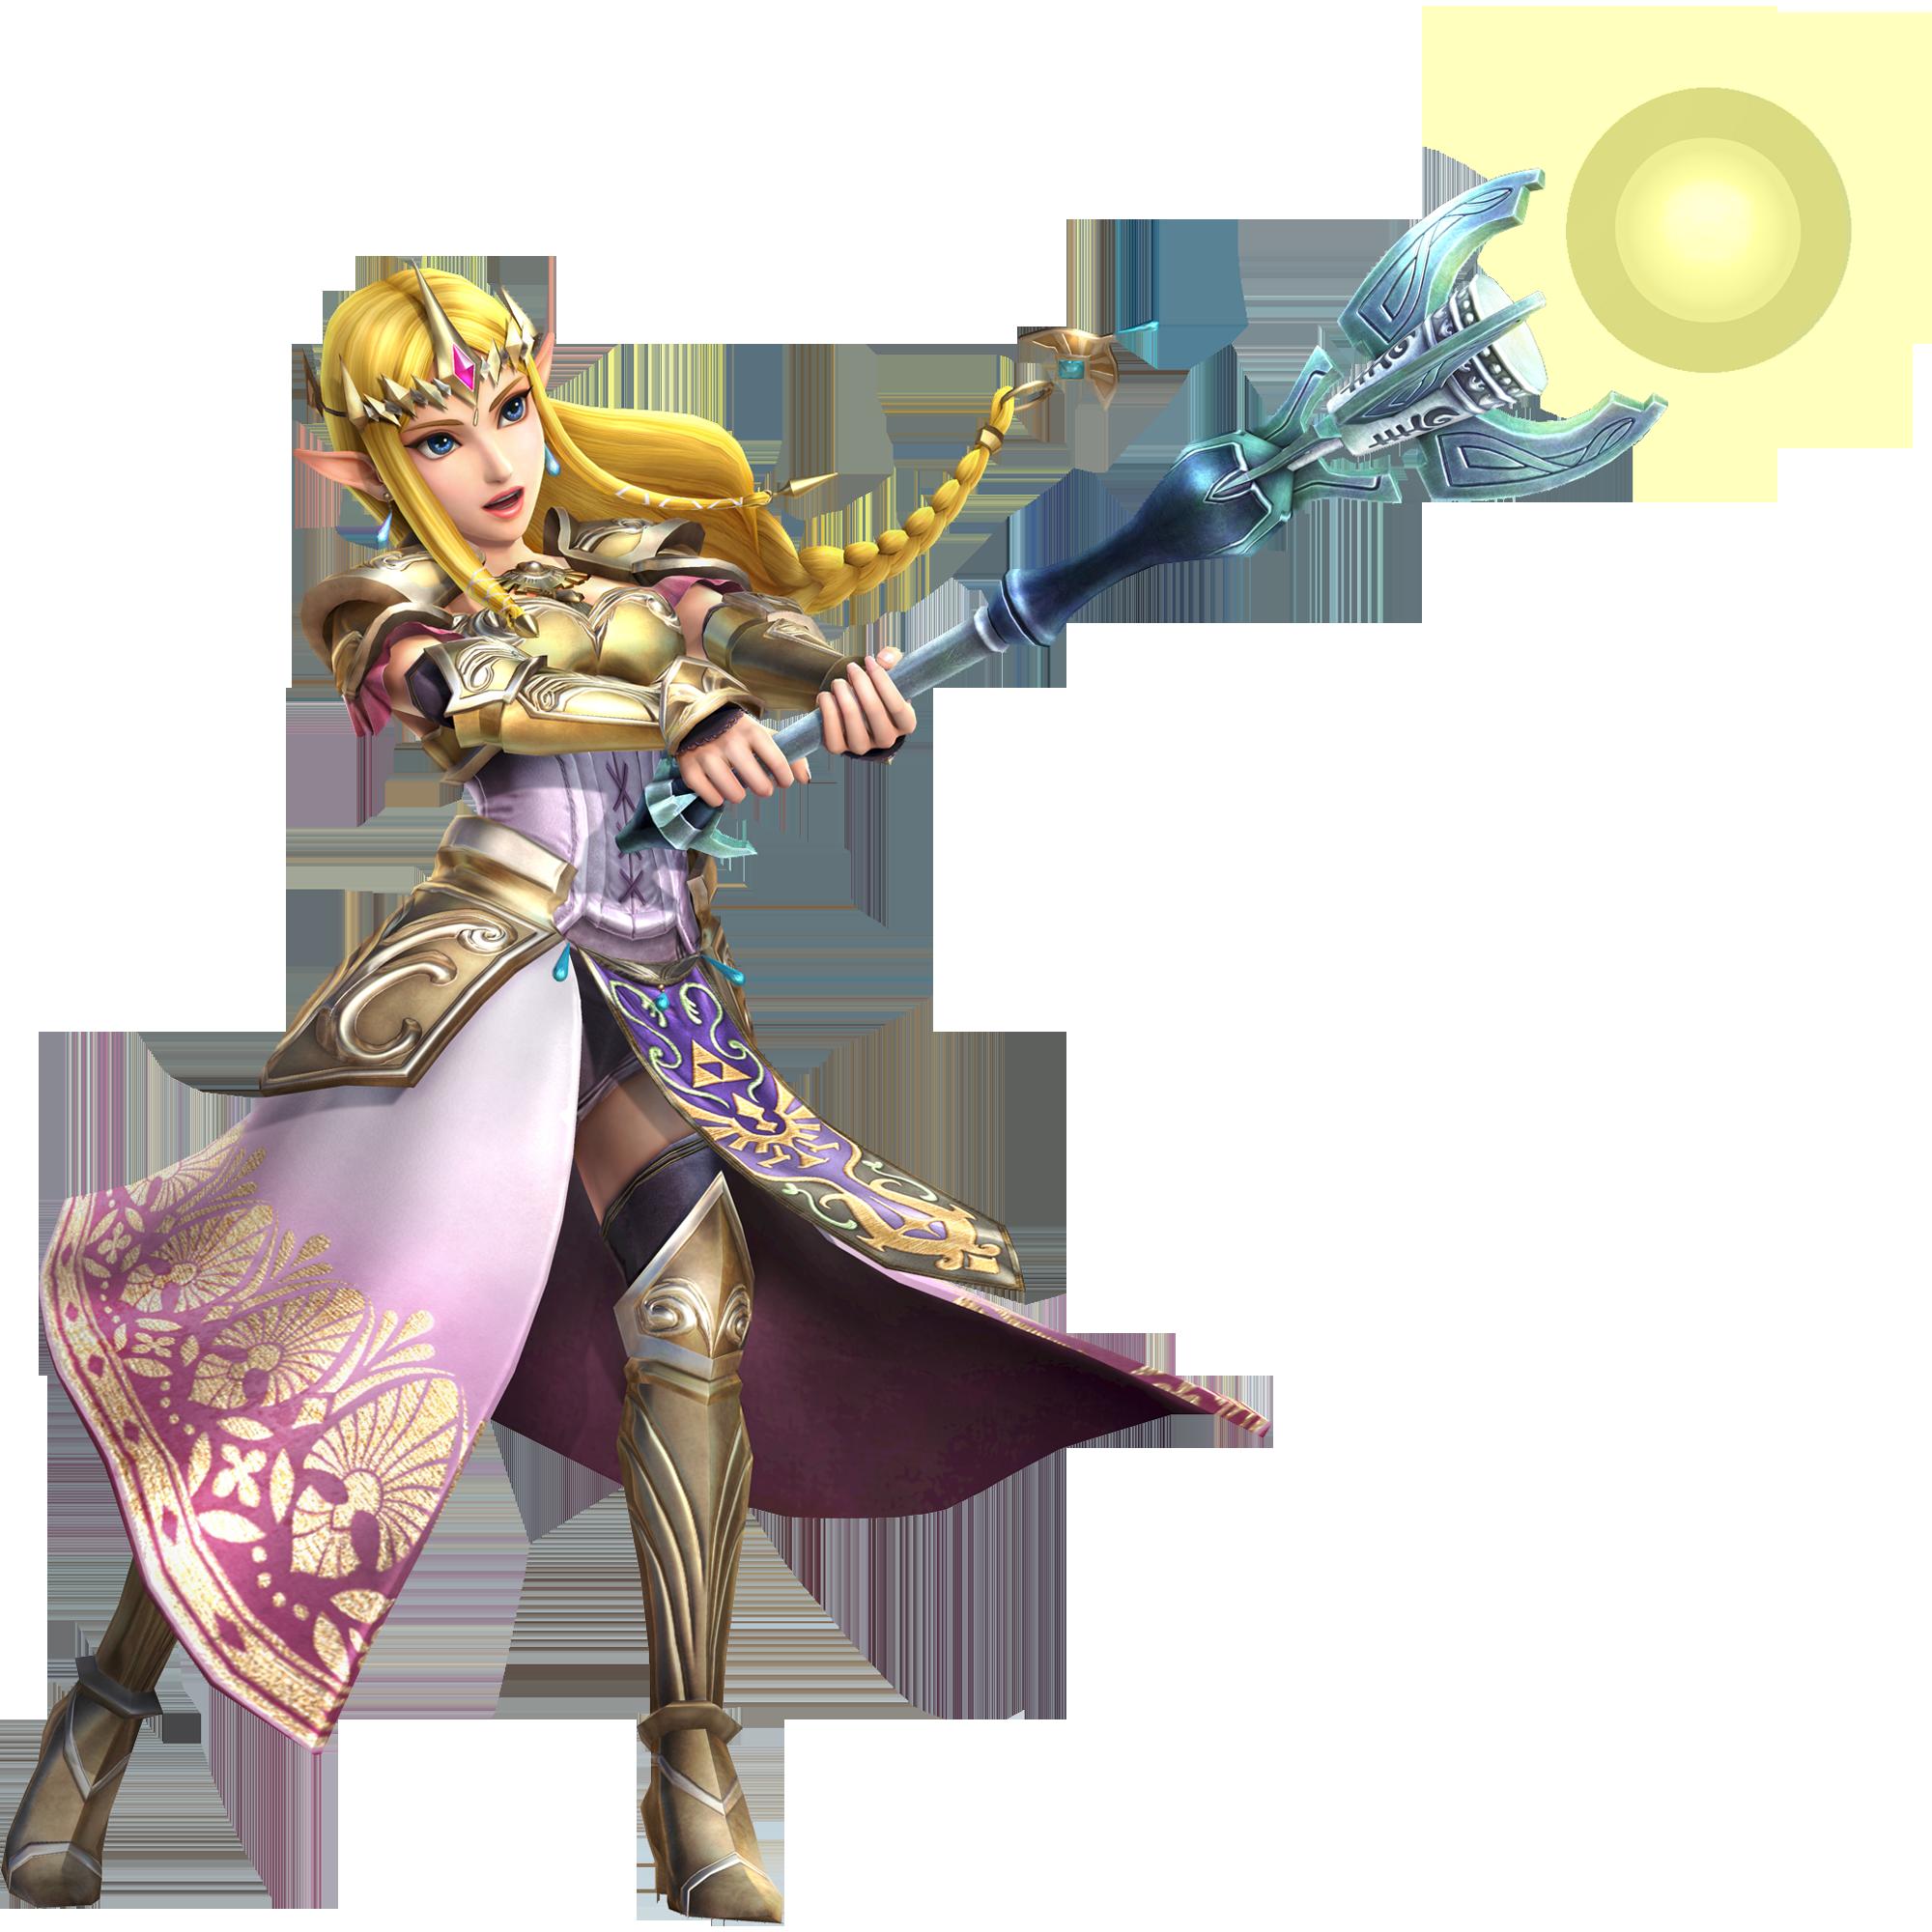 Dominion Rod Hyrule Warriors Zeldapedia Fandom